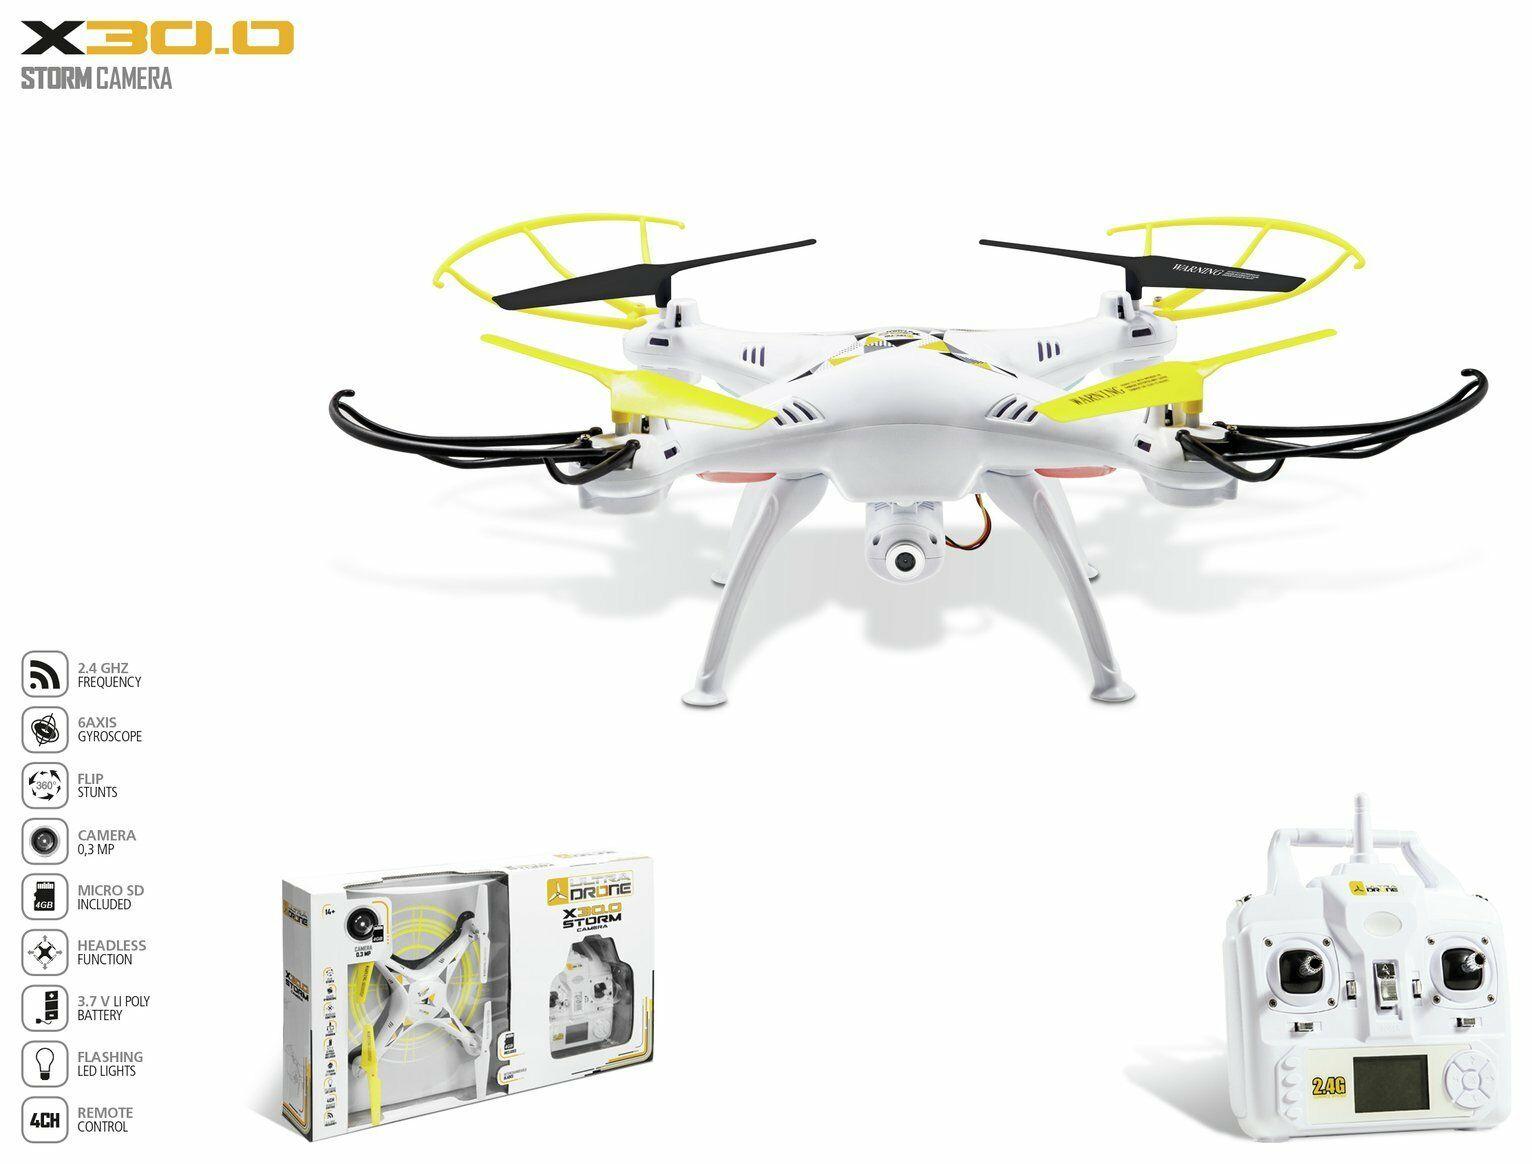 X30 Storm Camera Drone - £16.99 @ Argos eBay